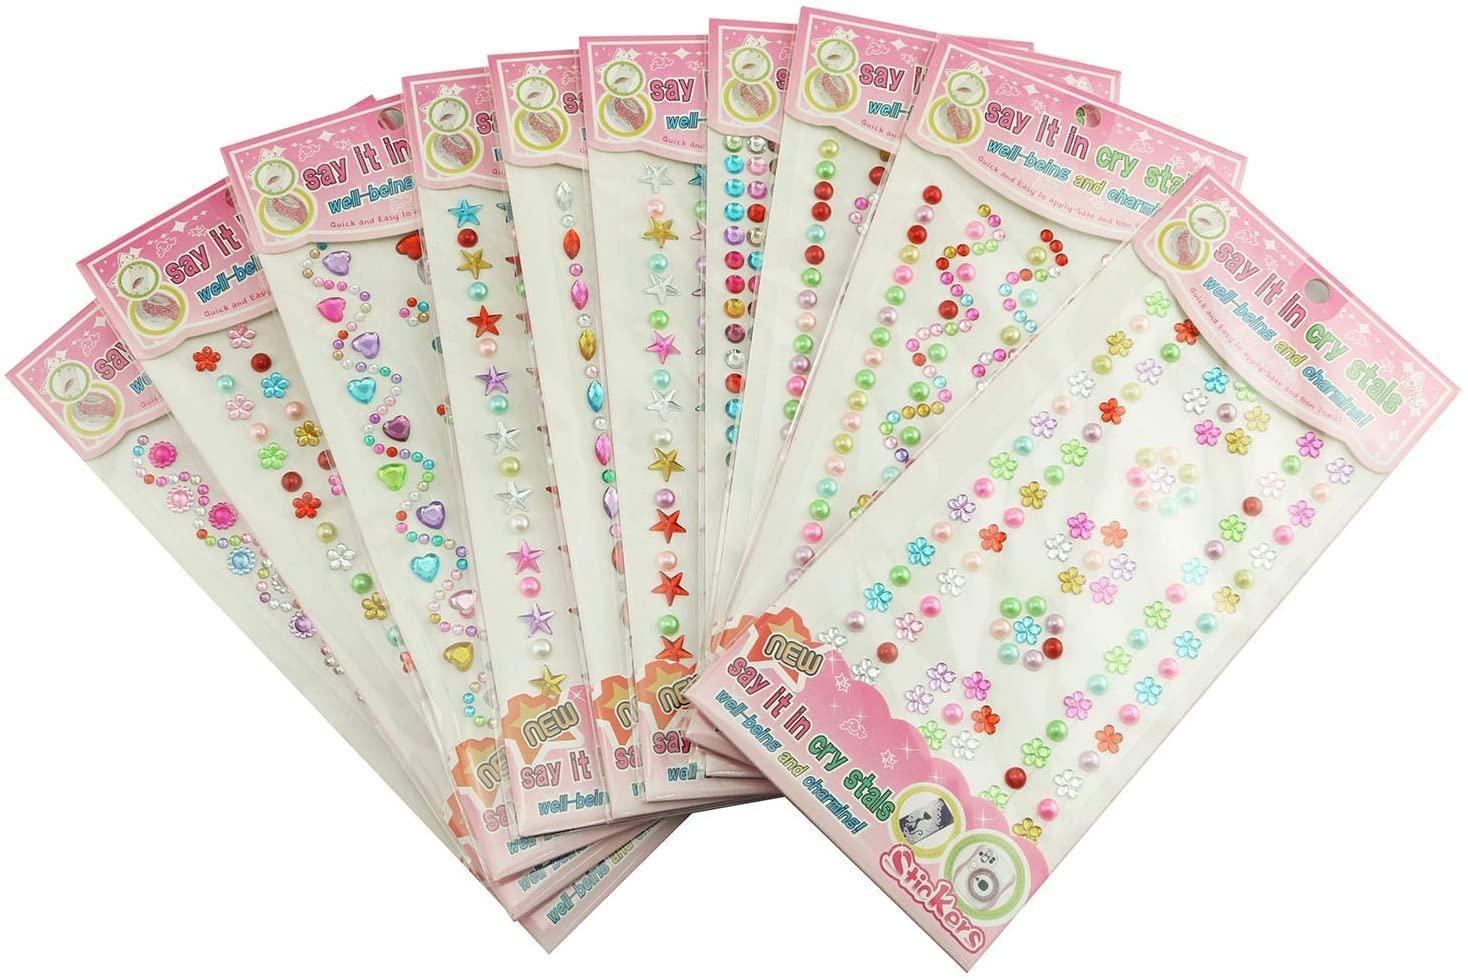 Tegg Jewels Crystal Gem Stickers 10 Sheet Colorful Bling Self-Adhesive Rhinestone Sticker